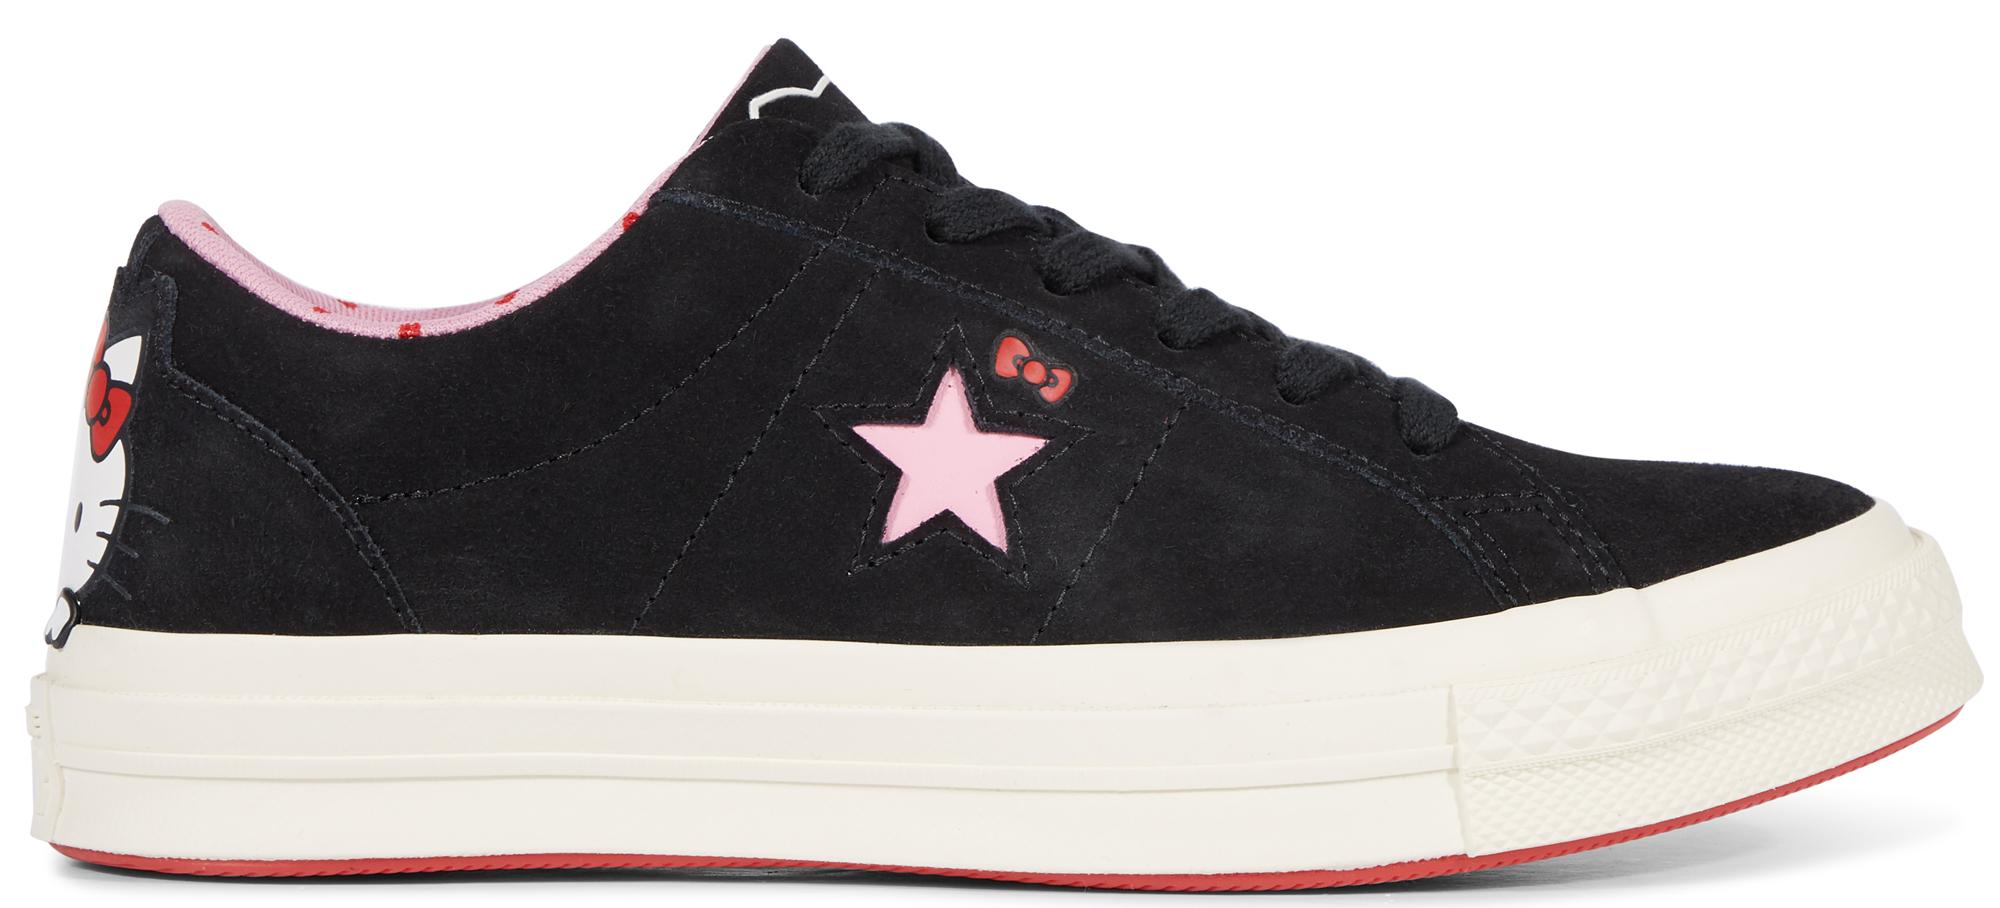 Converse One Star Ox Hello Kitty Black